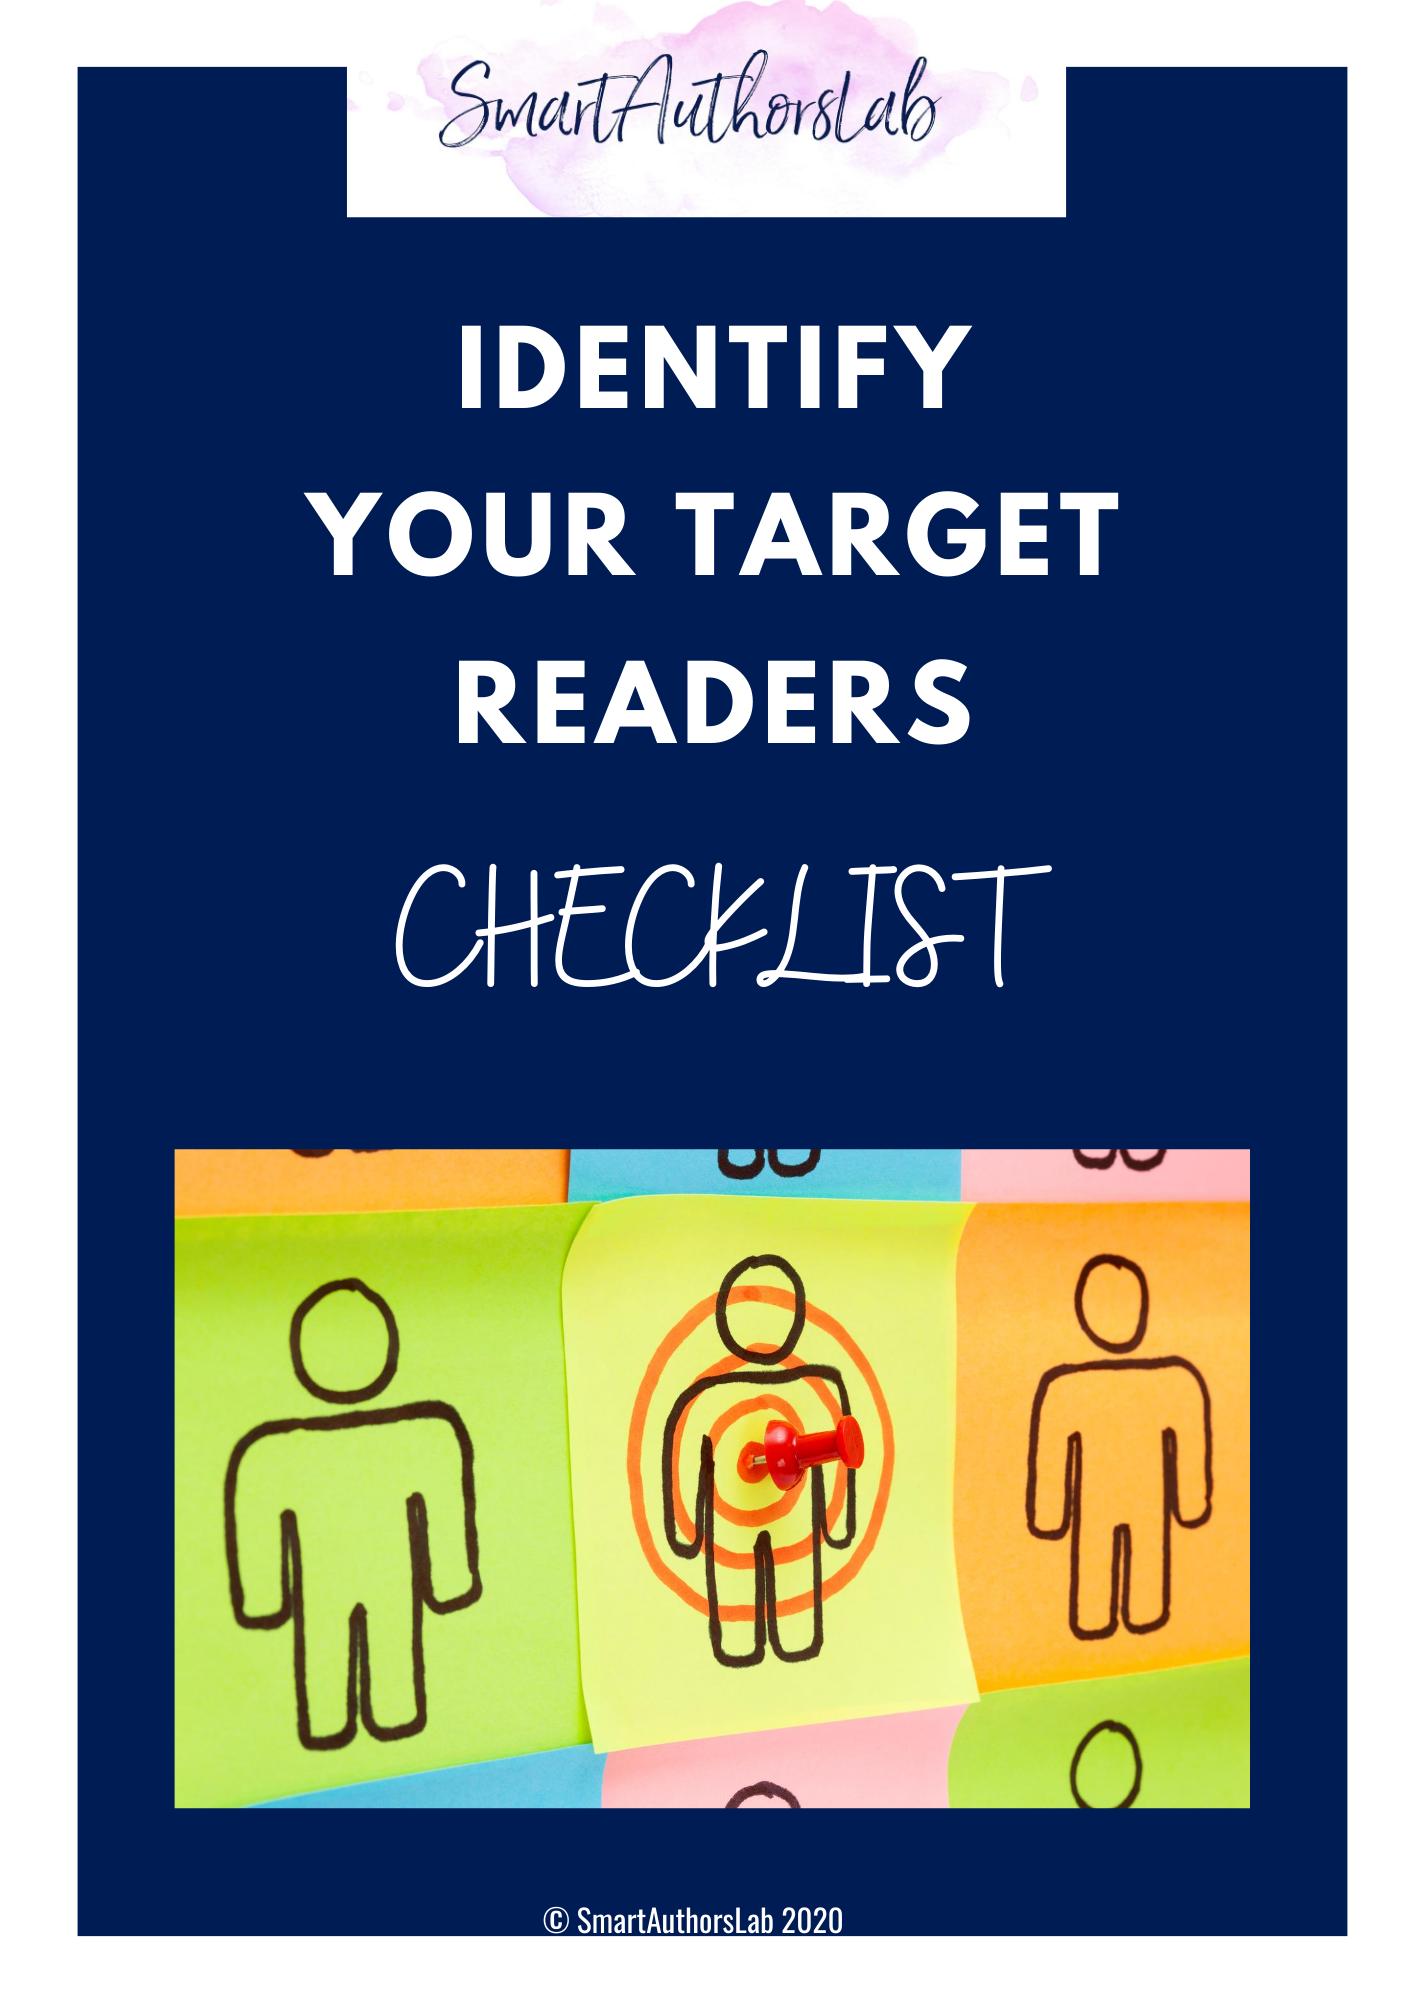 Target Readers Checklist